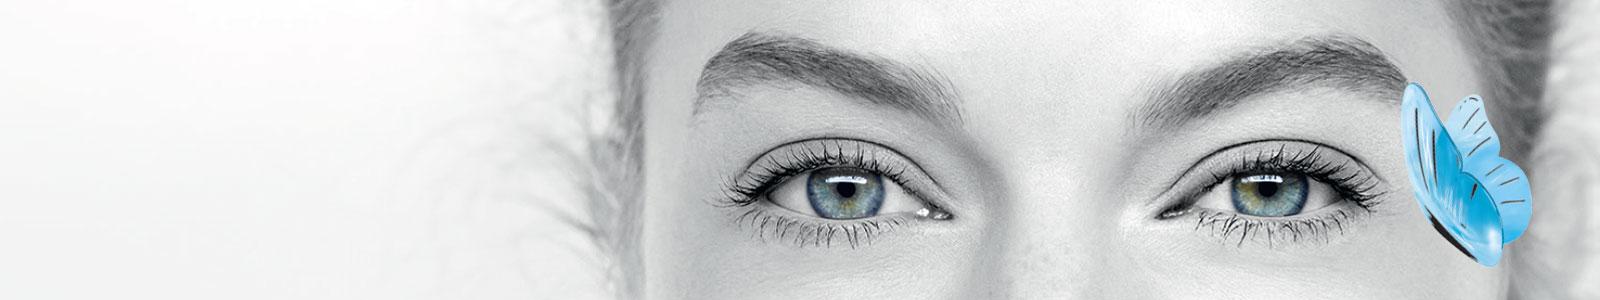 danio.store_catalog.contact-lens.banner.alt